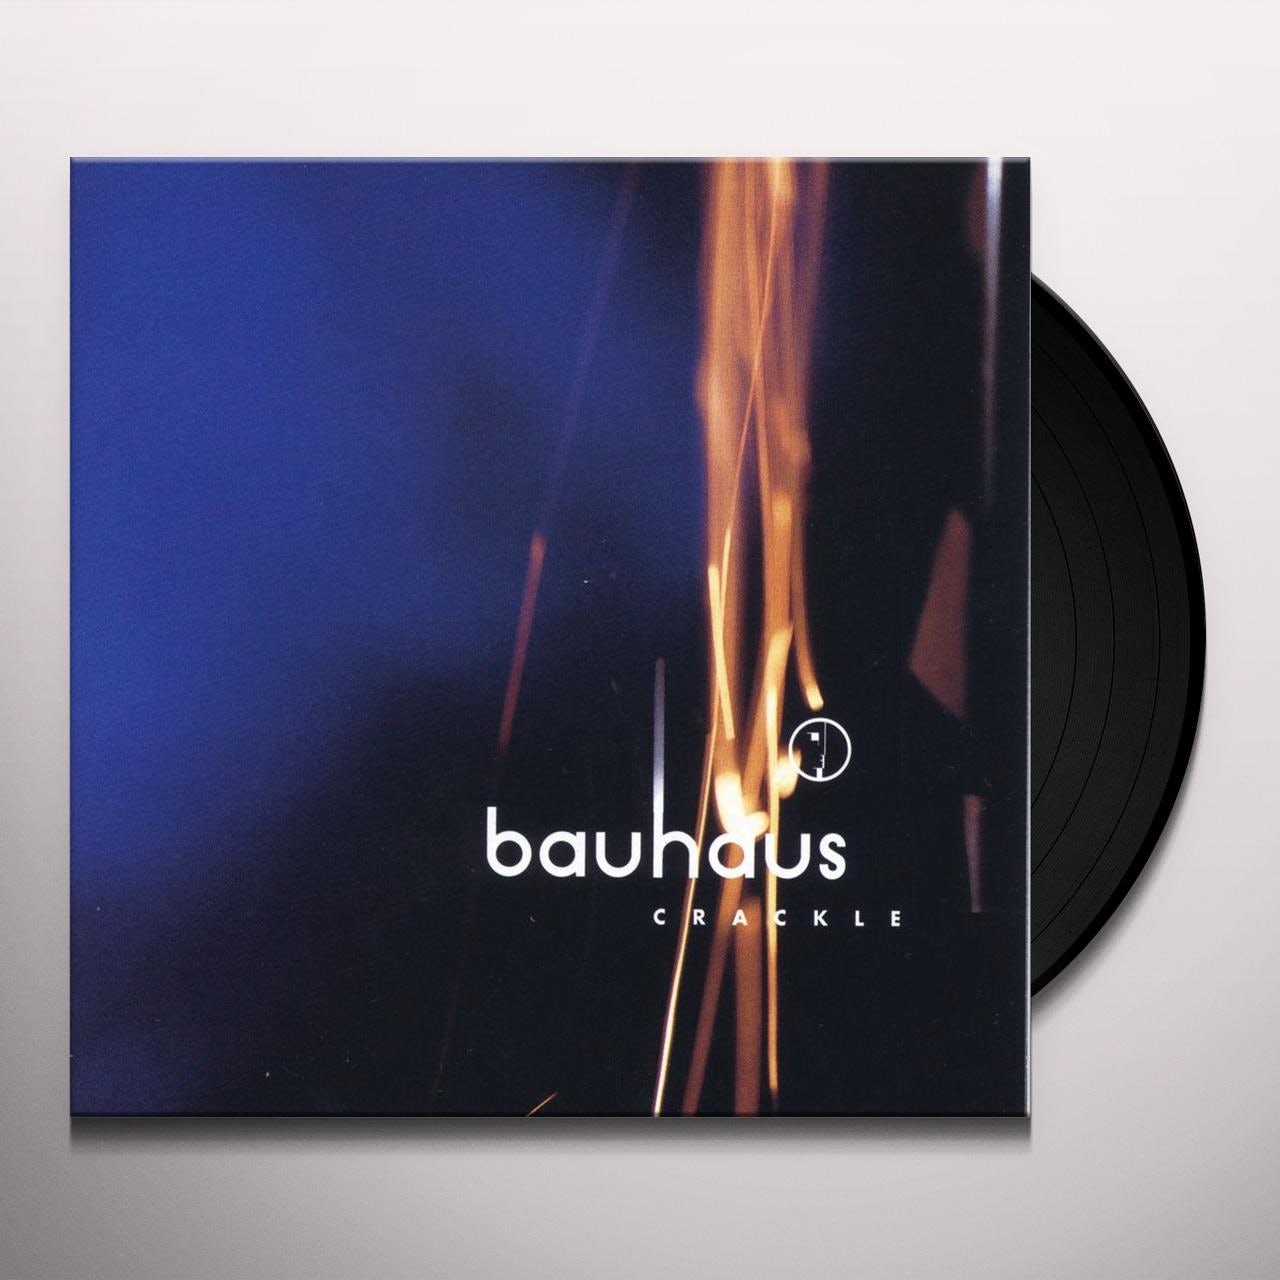 Best Of Bauhaus Crackle